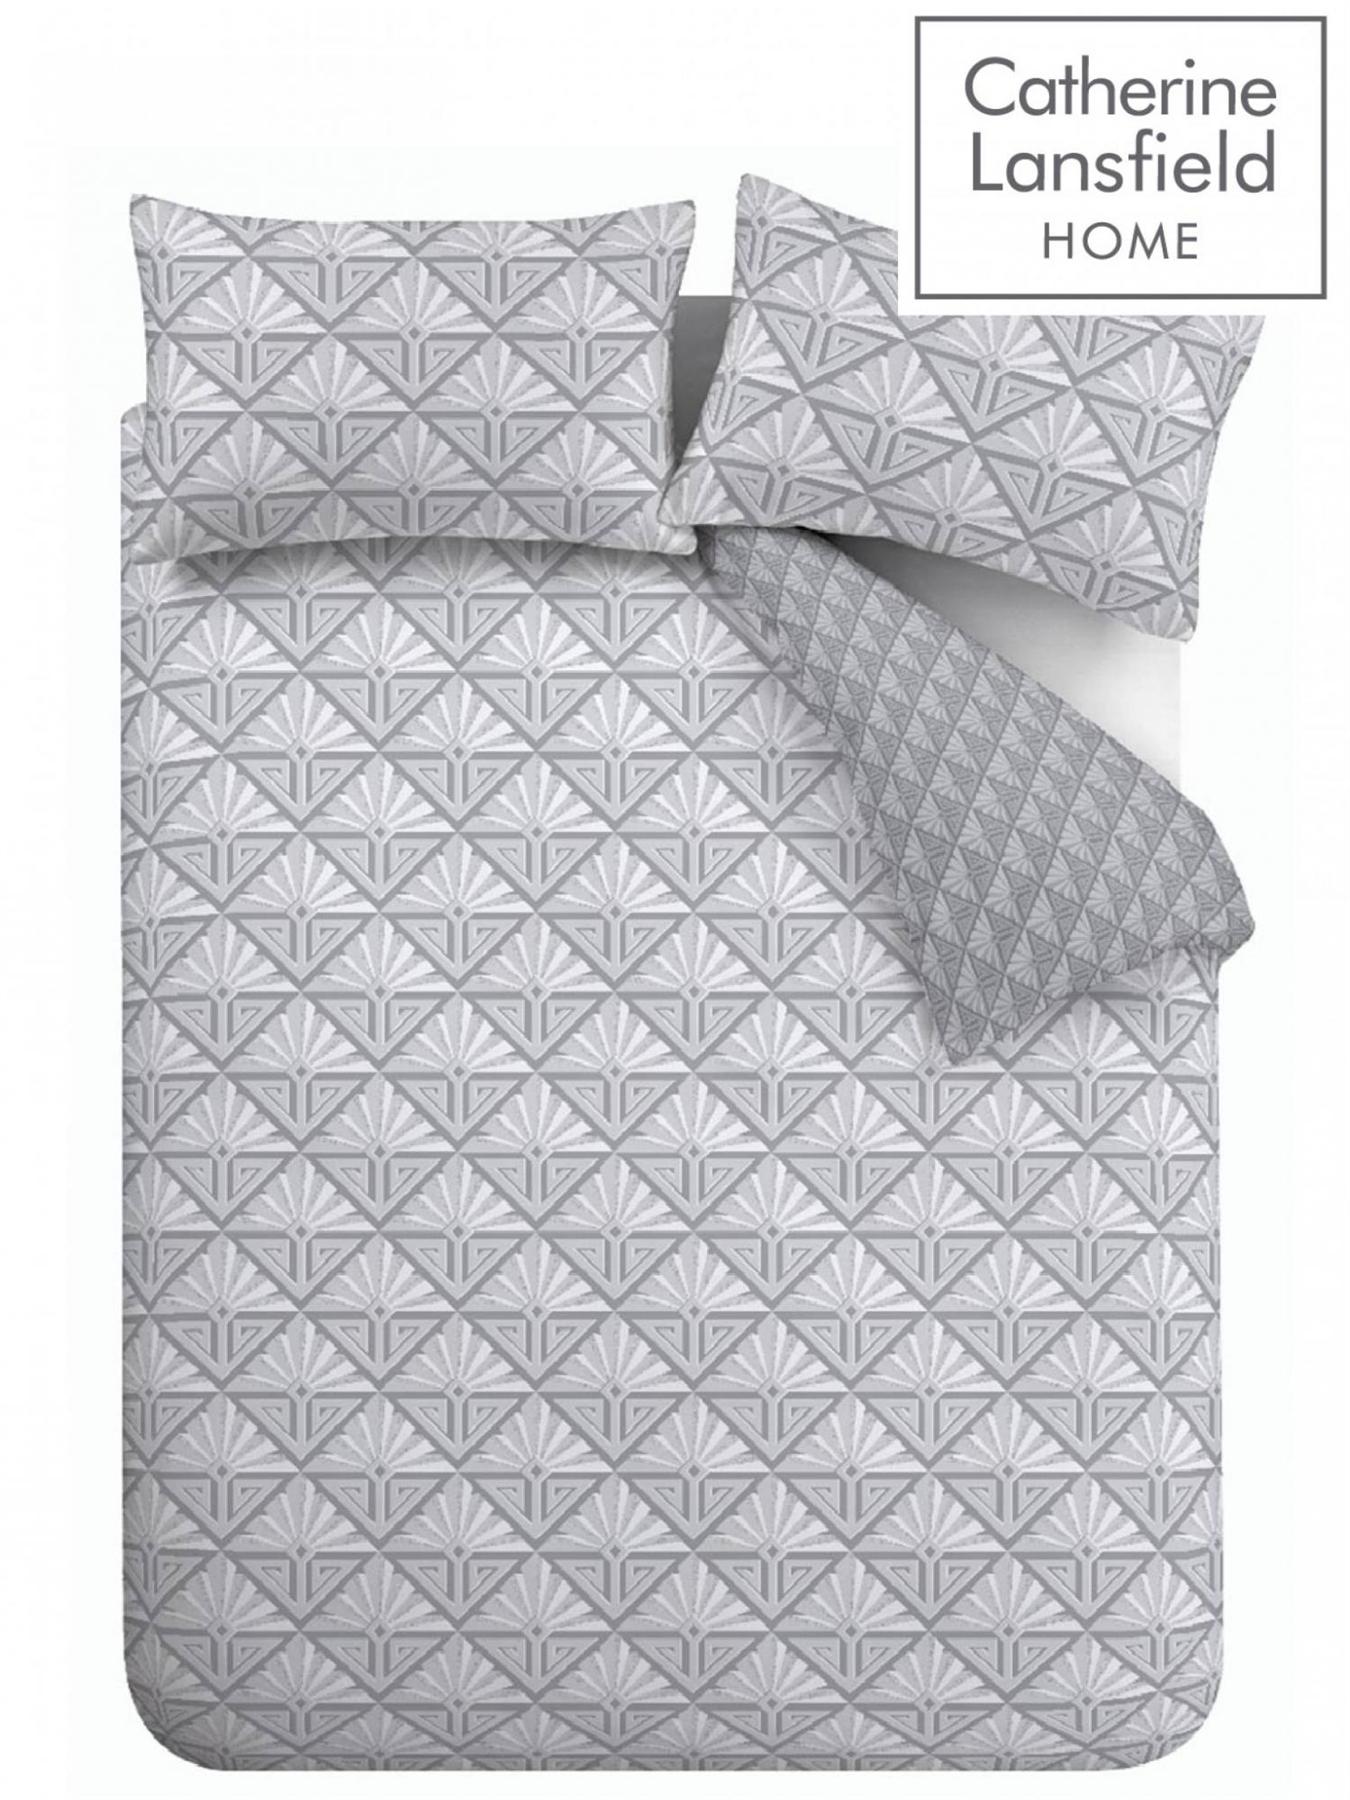 Catherine-Lansfield-Duvet-Set-Reversible-Art-Deco-Grey-Bedding-Pillows-Curtains thumbnail 20